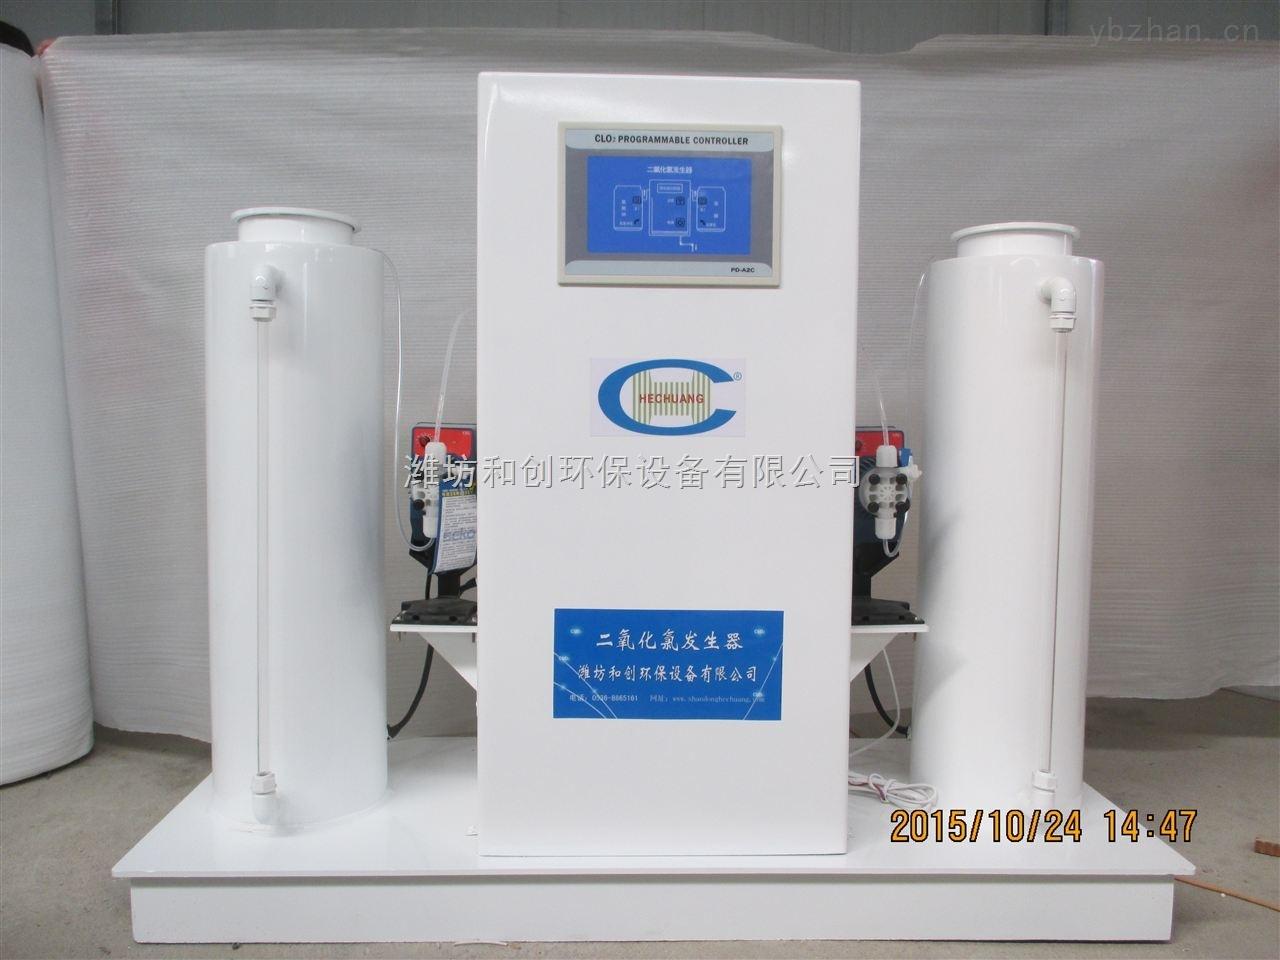 HCZY-湘潭市医院污水处理二氧化氯发生器消毒设备